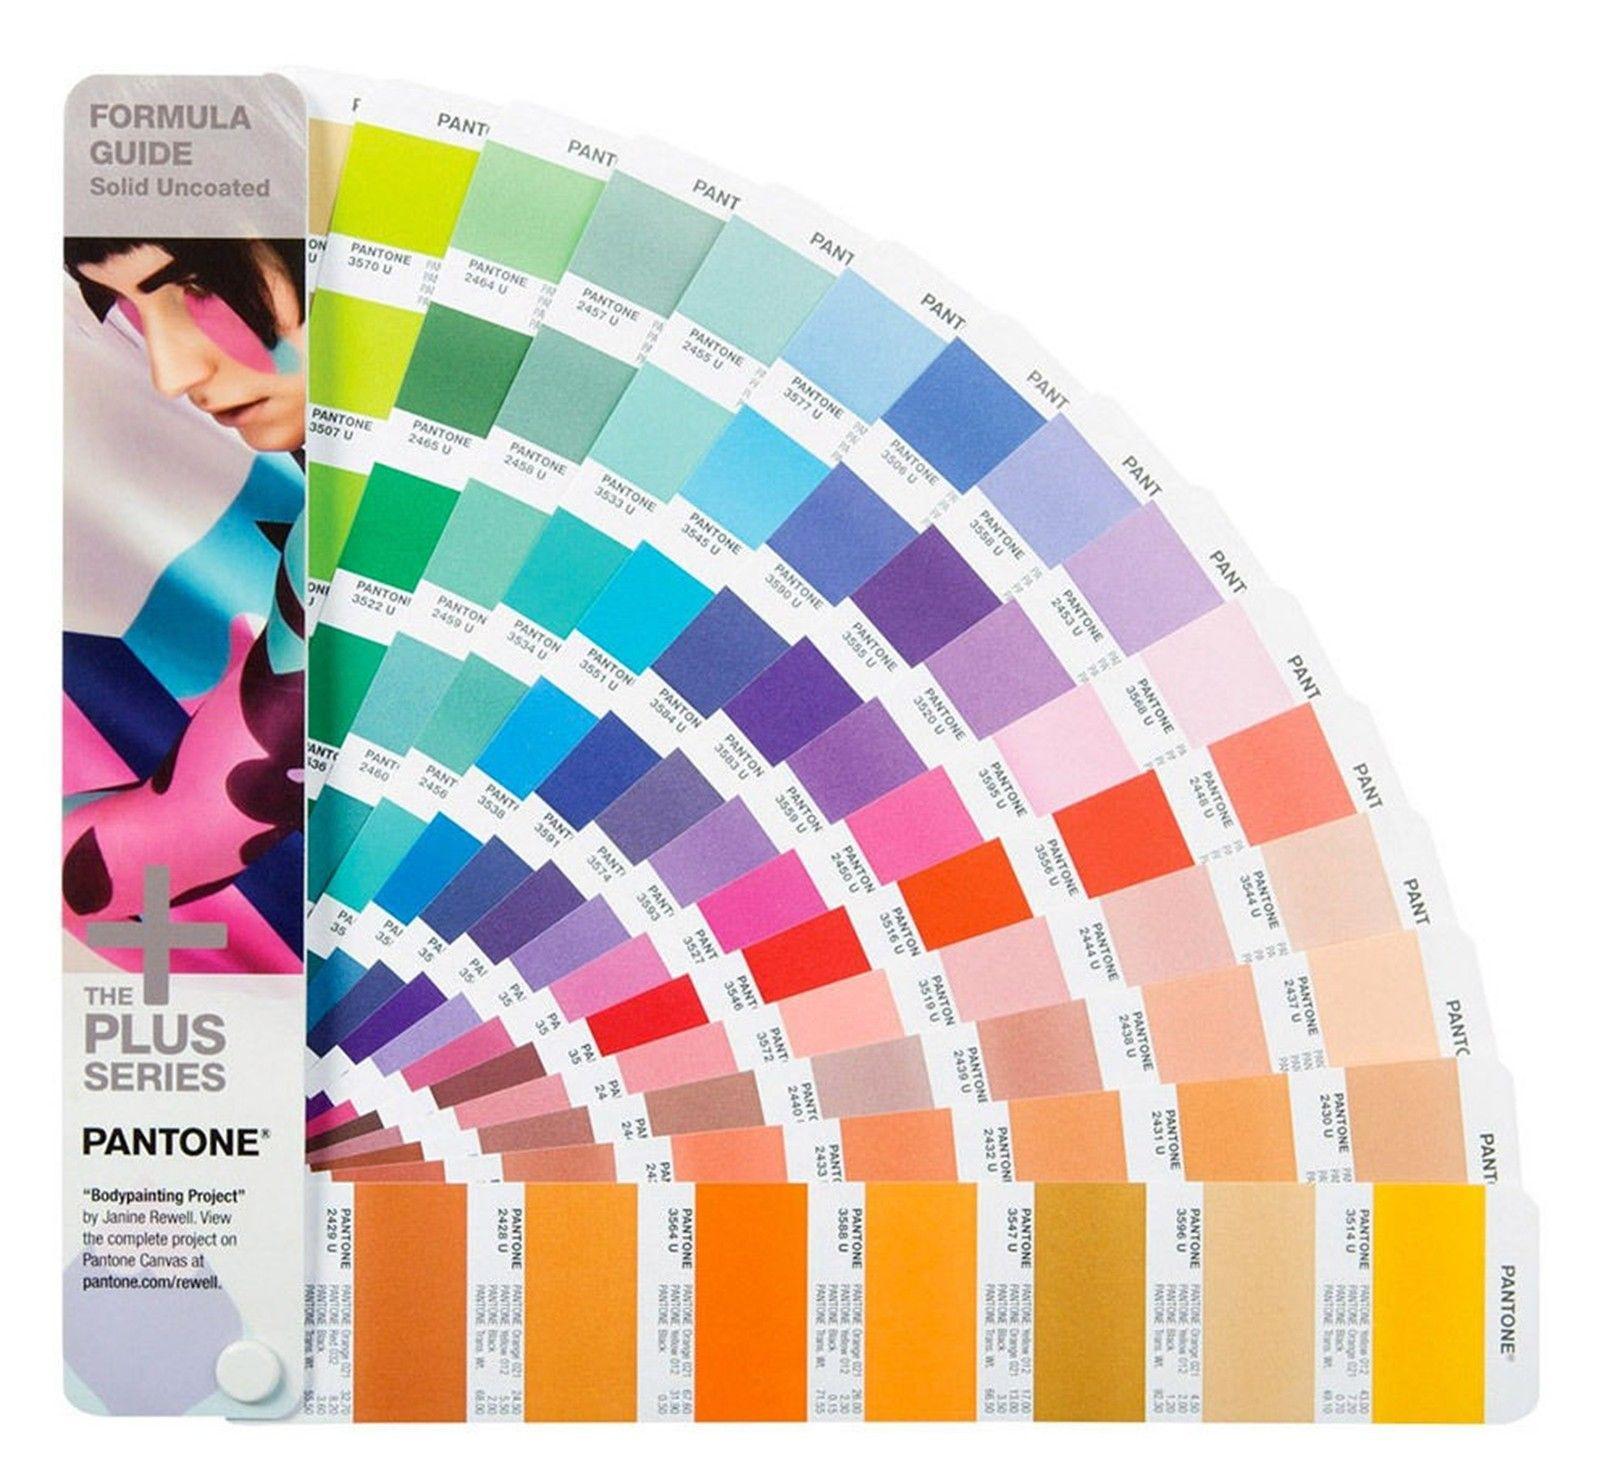 Pantone Plus Series Formula Guide Solid Uncoated Only GP1601N  2016 +112 Color pantone colour puzzles